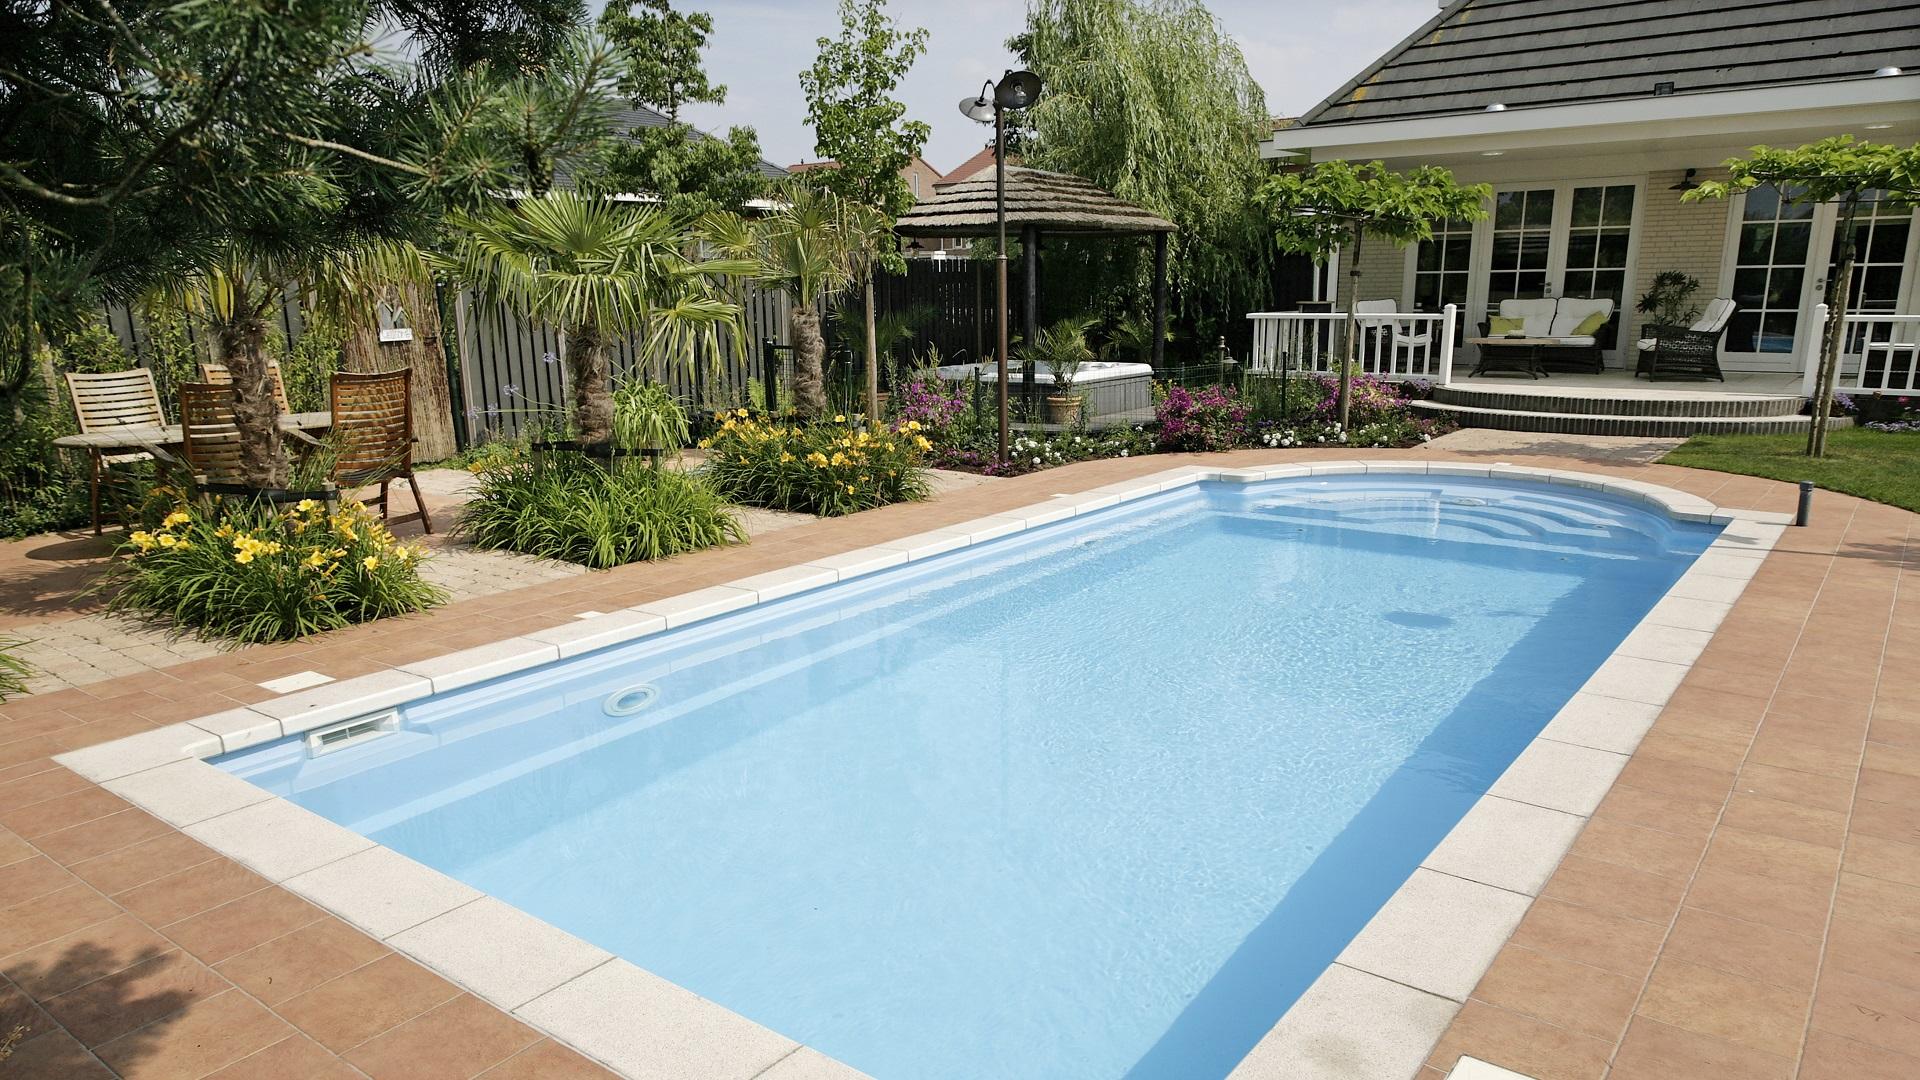 Swimmingpool #1